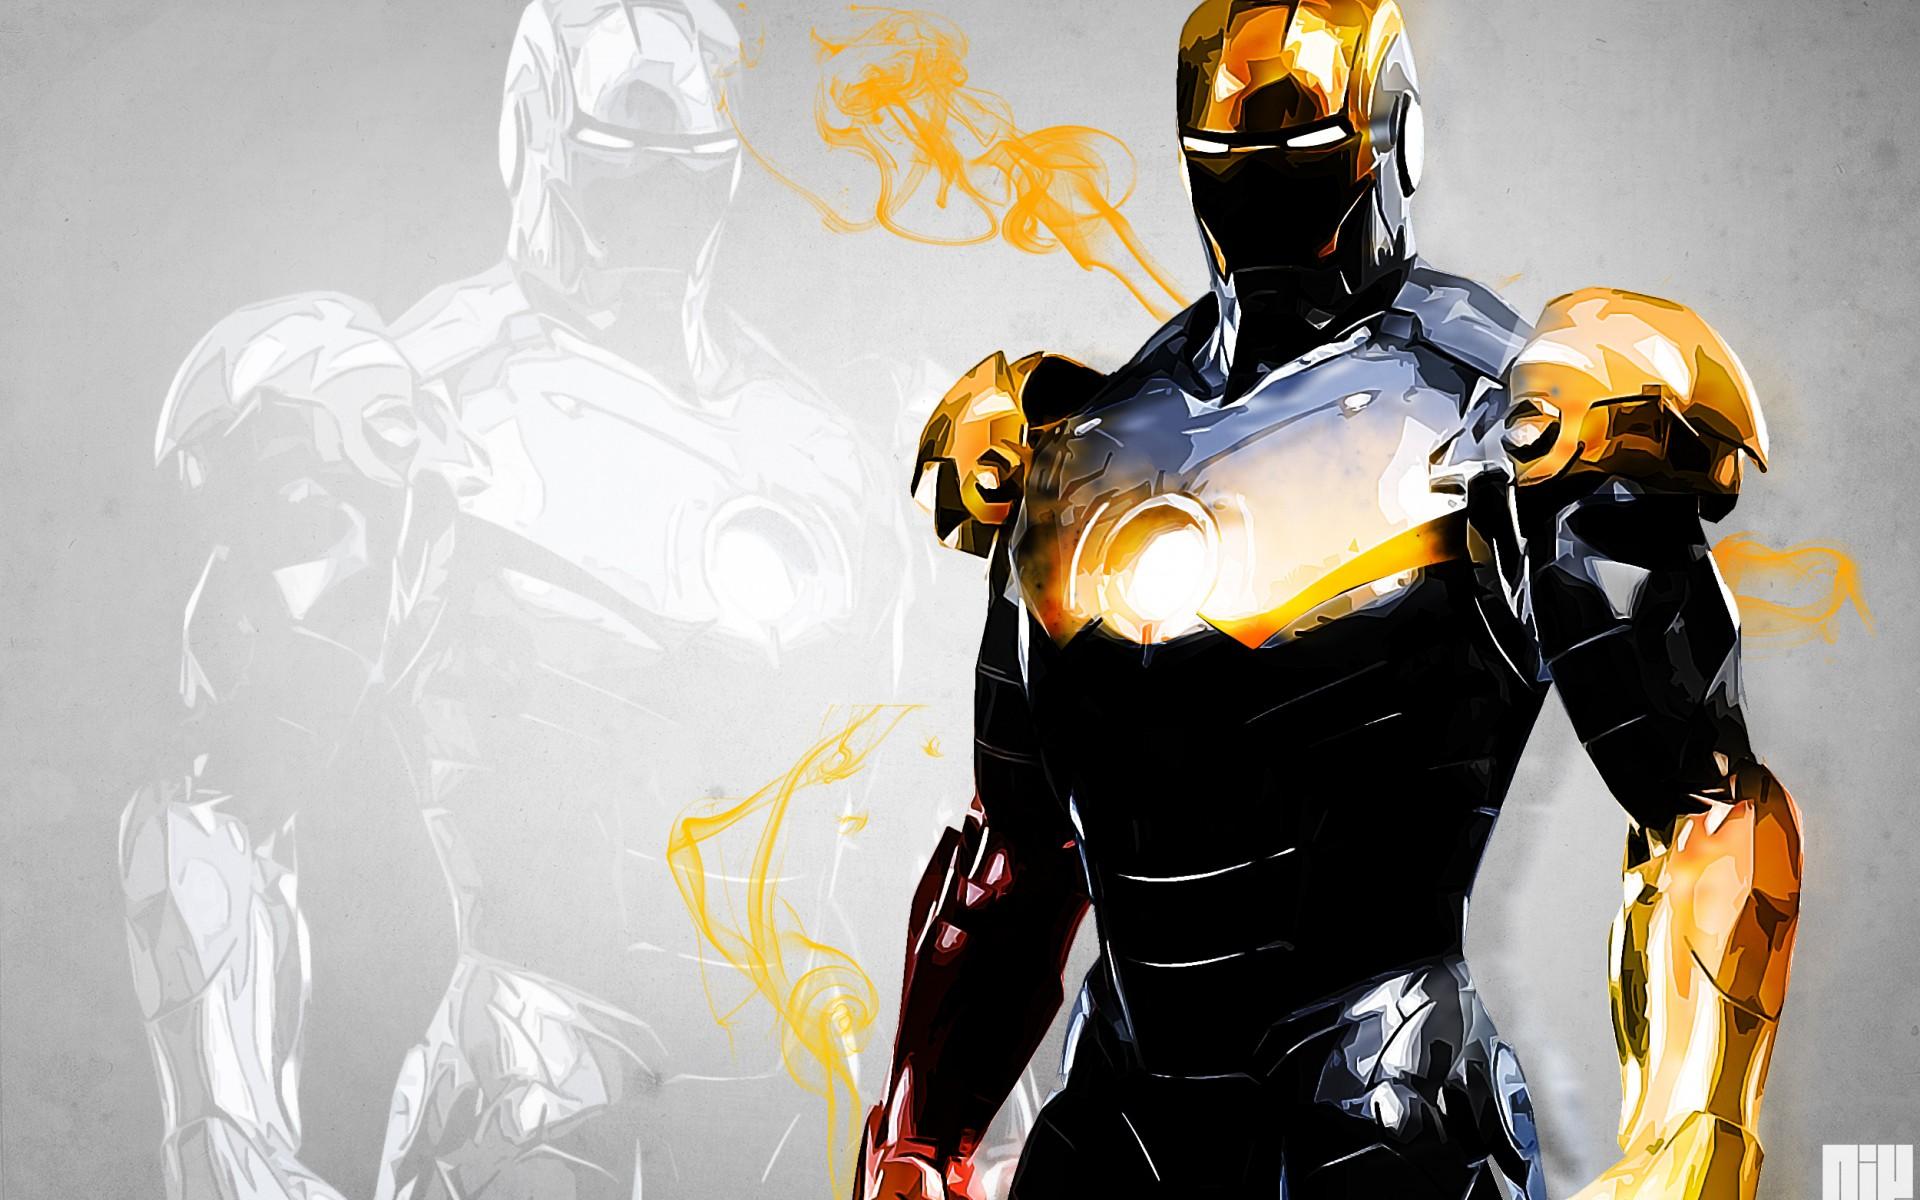 Superheroes wallpaper hd wallpapers blog iron man marvel comics superhero wallpaper 1920x1200 84804 wallpaperup voltagebd Images